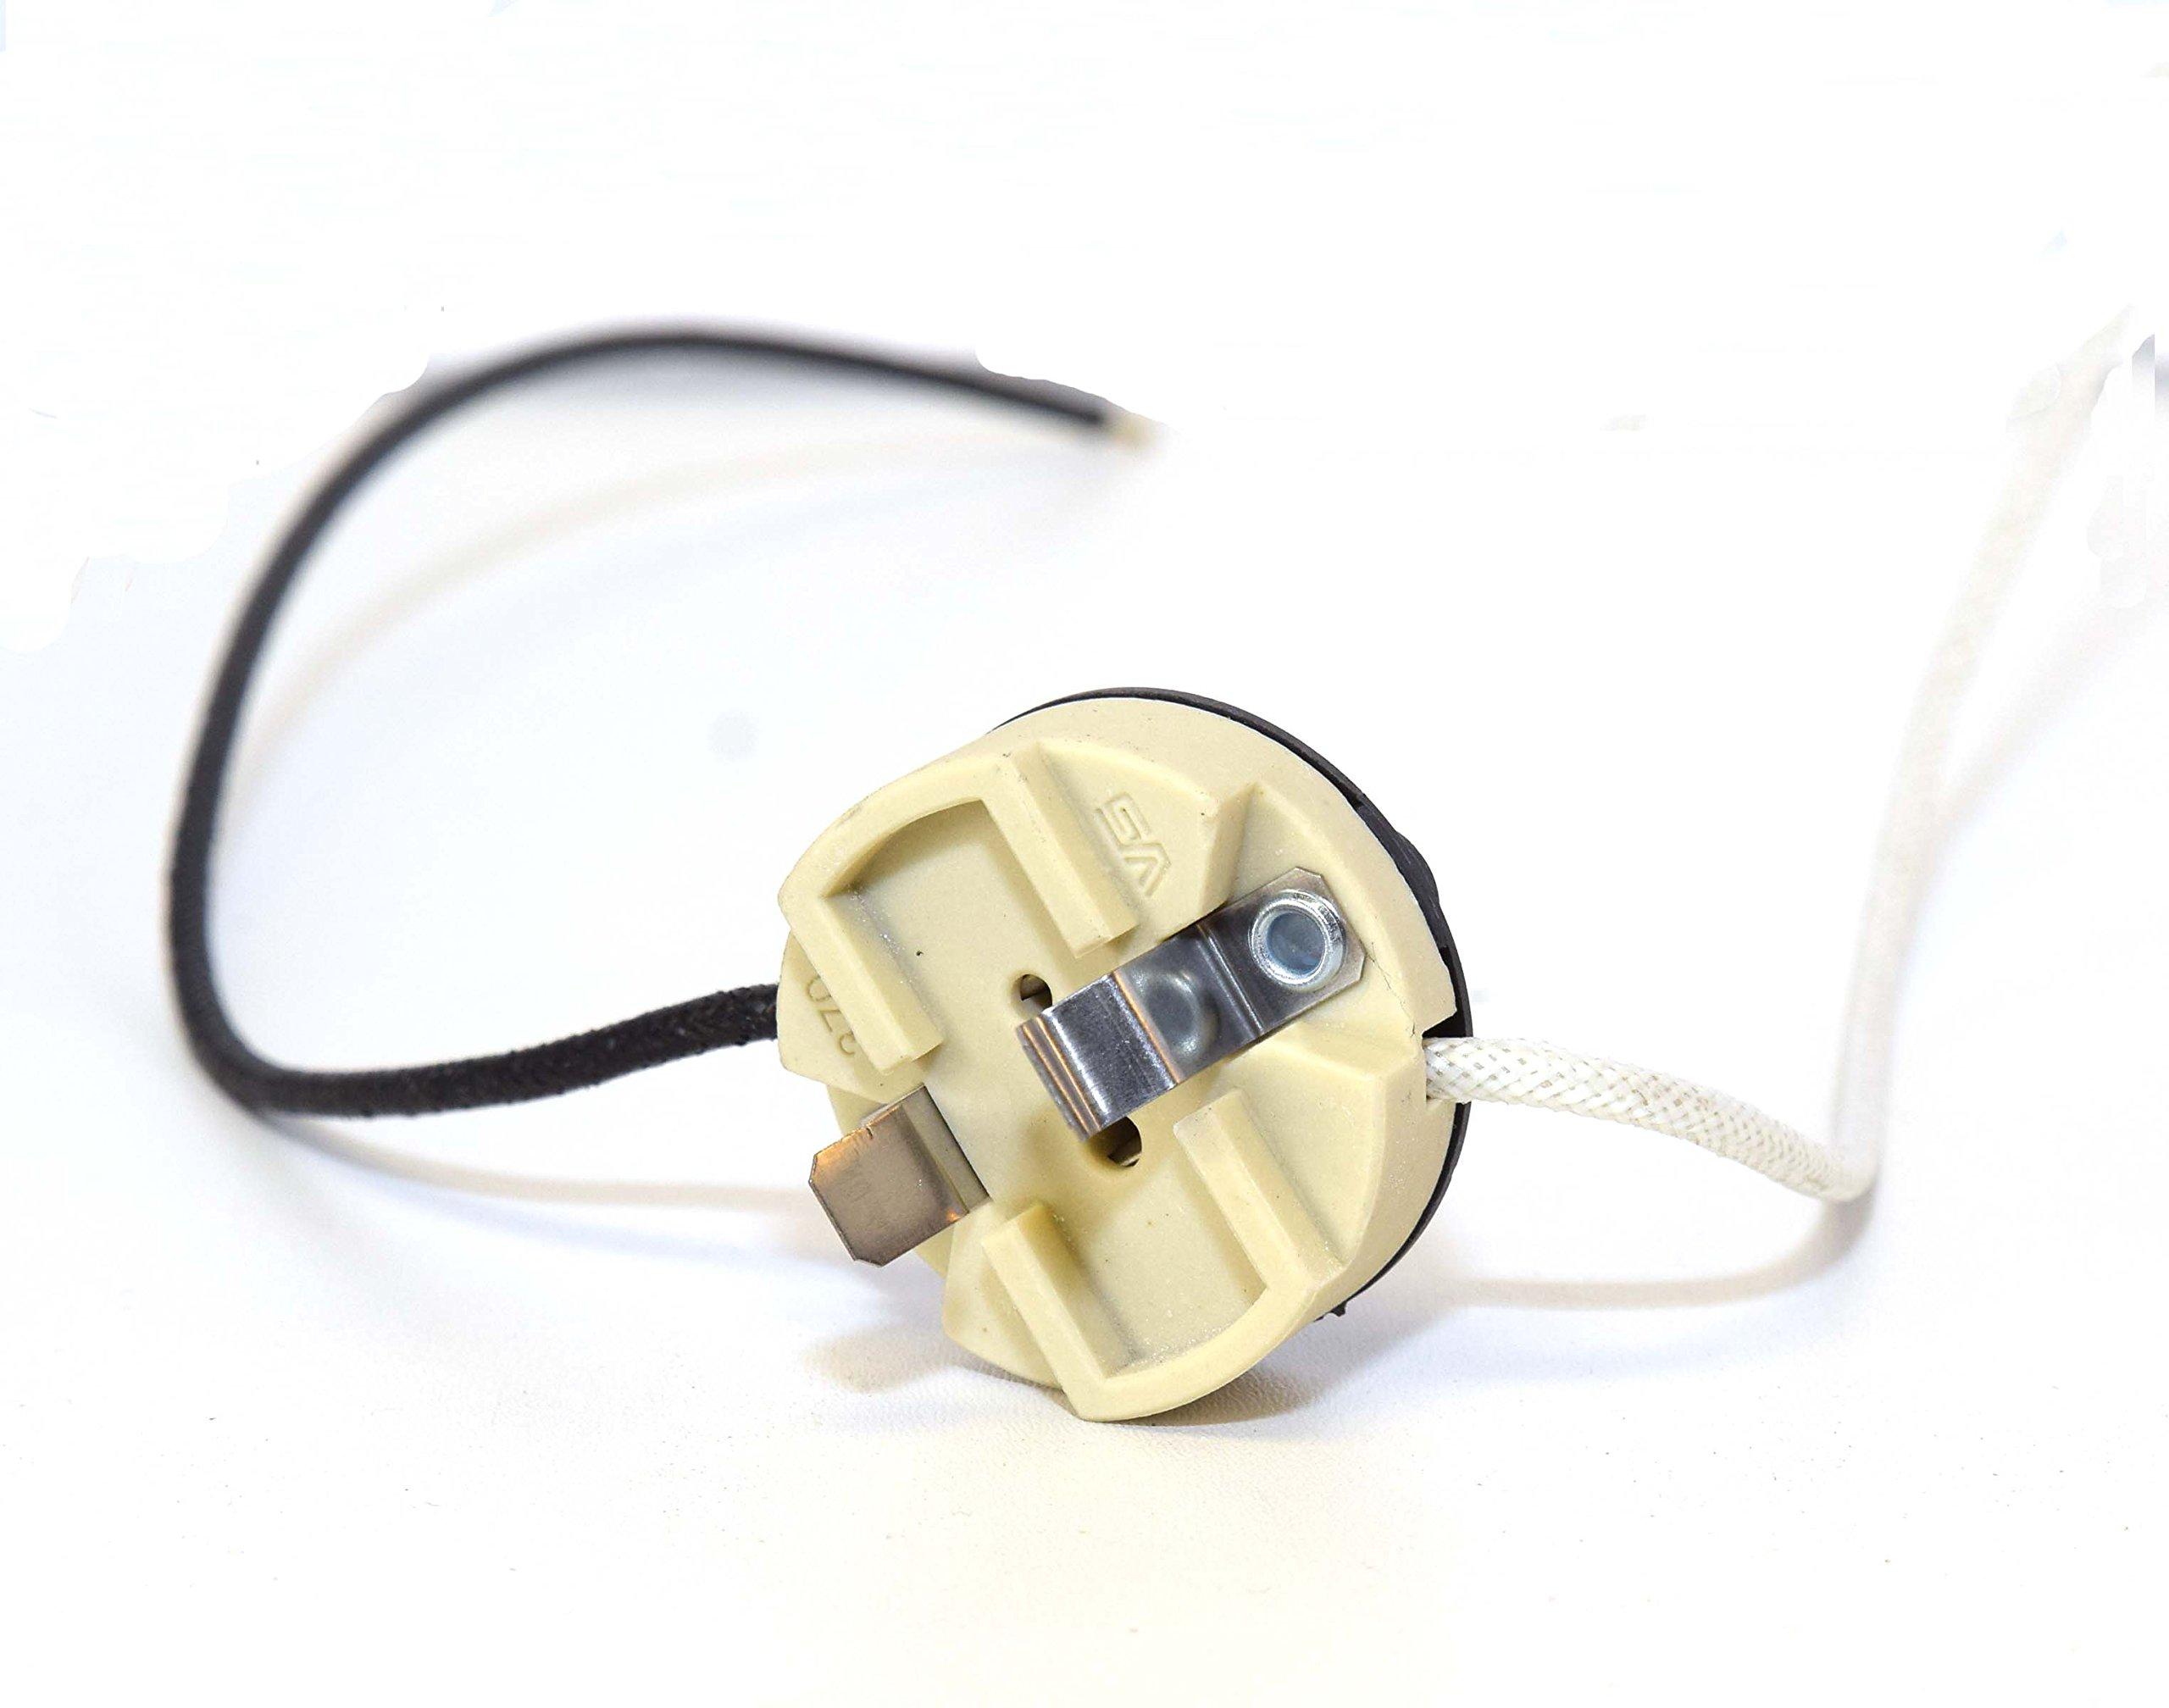 Vossloh T240 Facial Lamp Holder